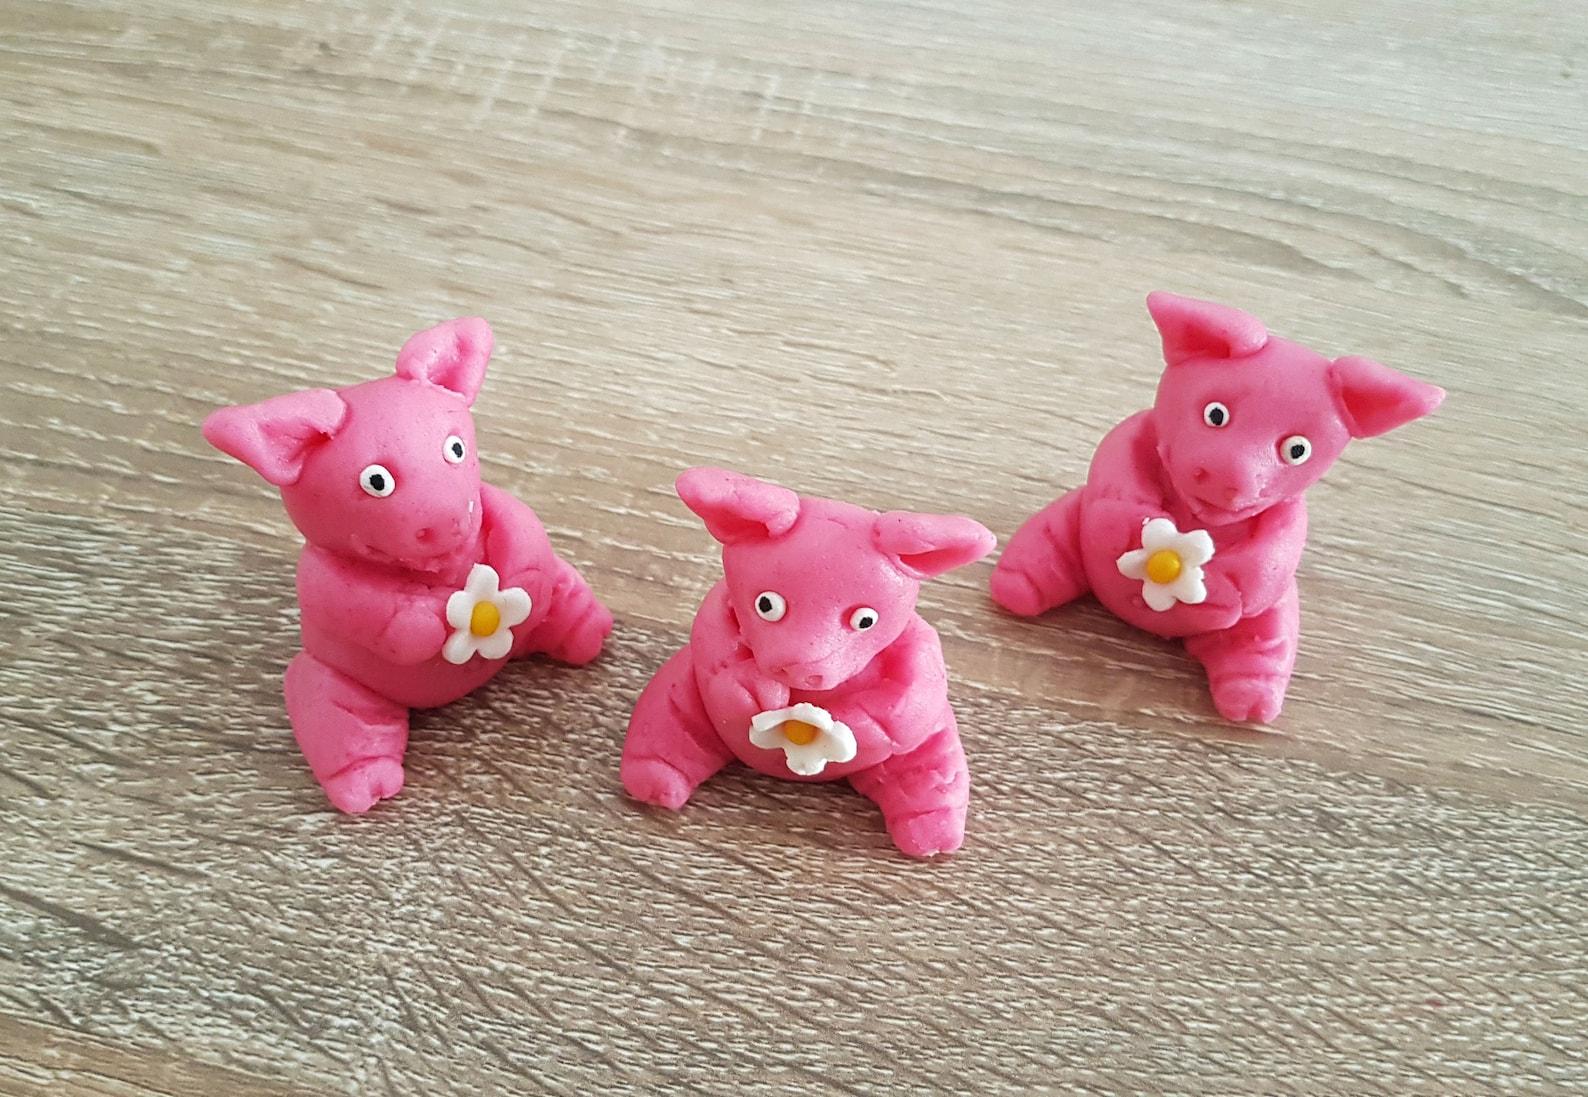 3 Marzipan pigs, Marzipan animal, edible marzipan cake topper